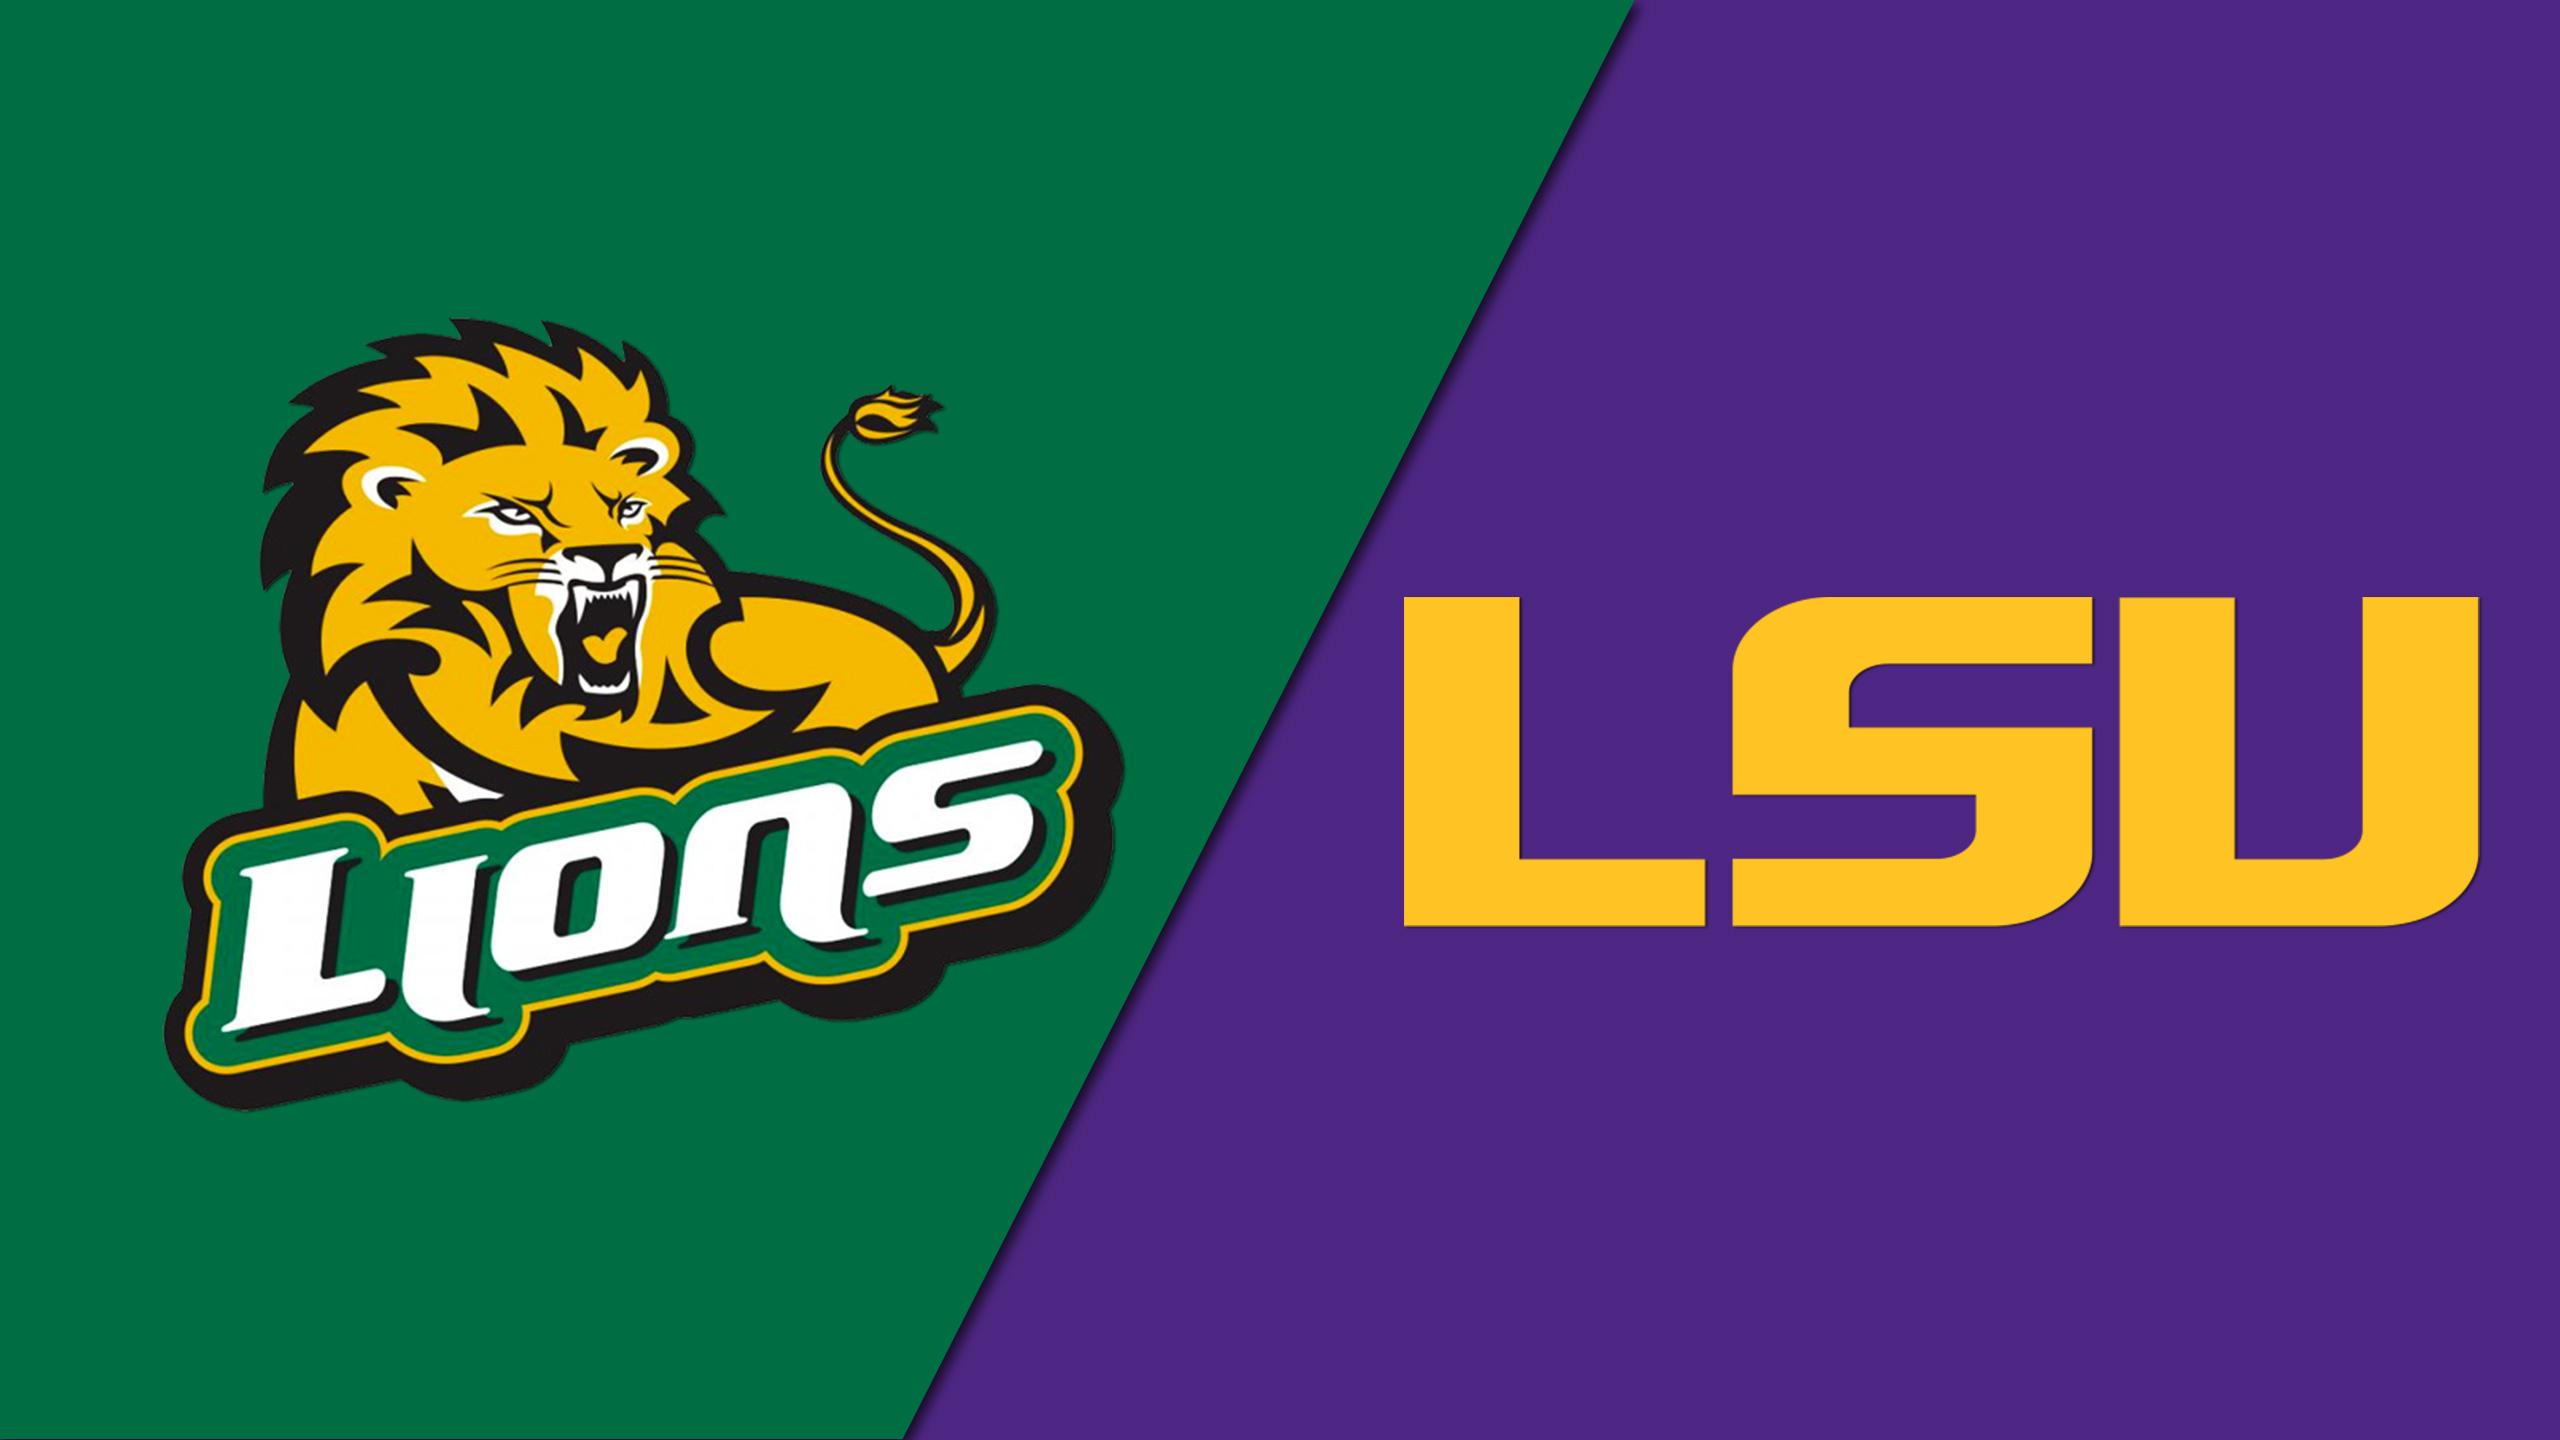 Southeastern Louisiana vs. LSU